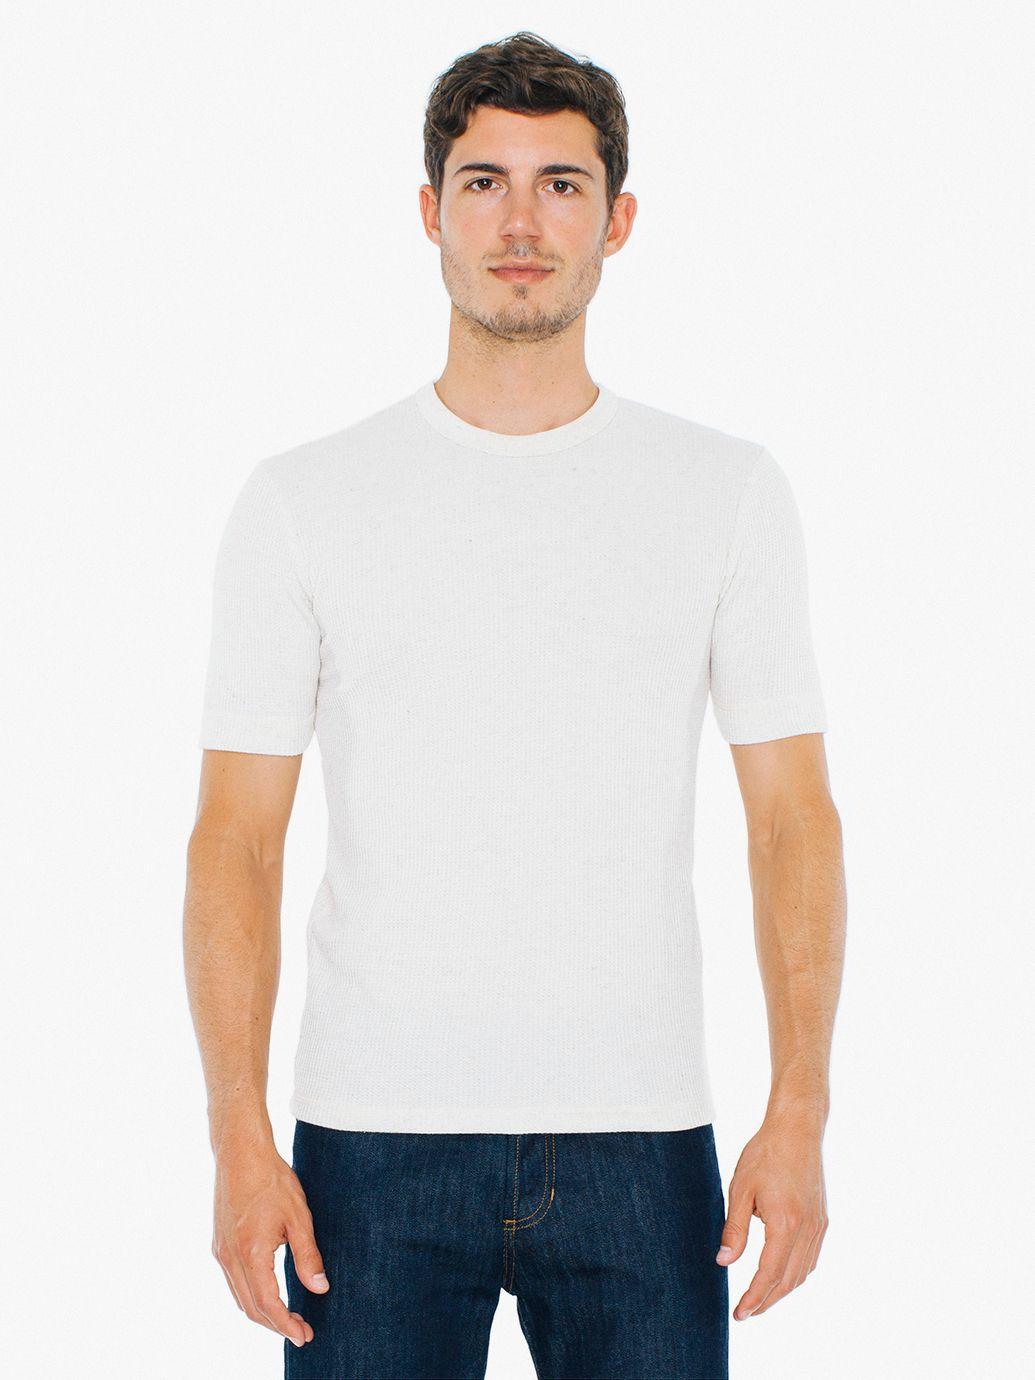 White T Shirt Long Sleeve